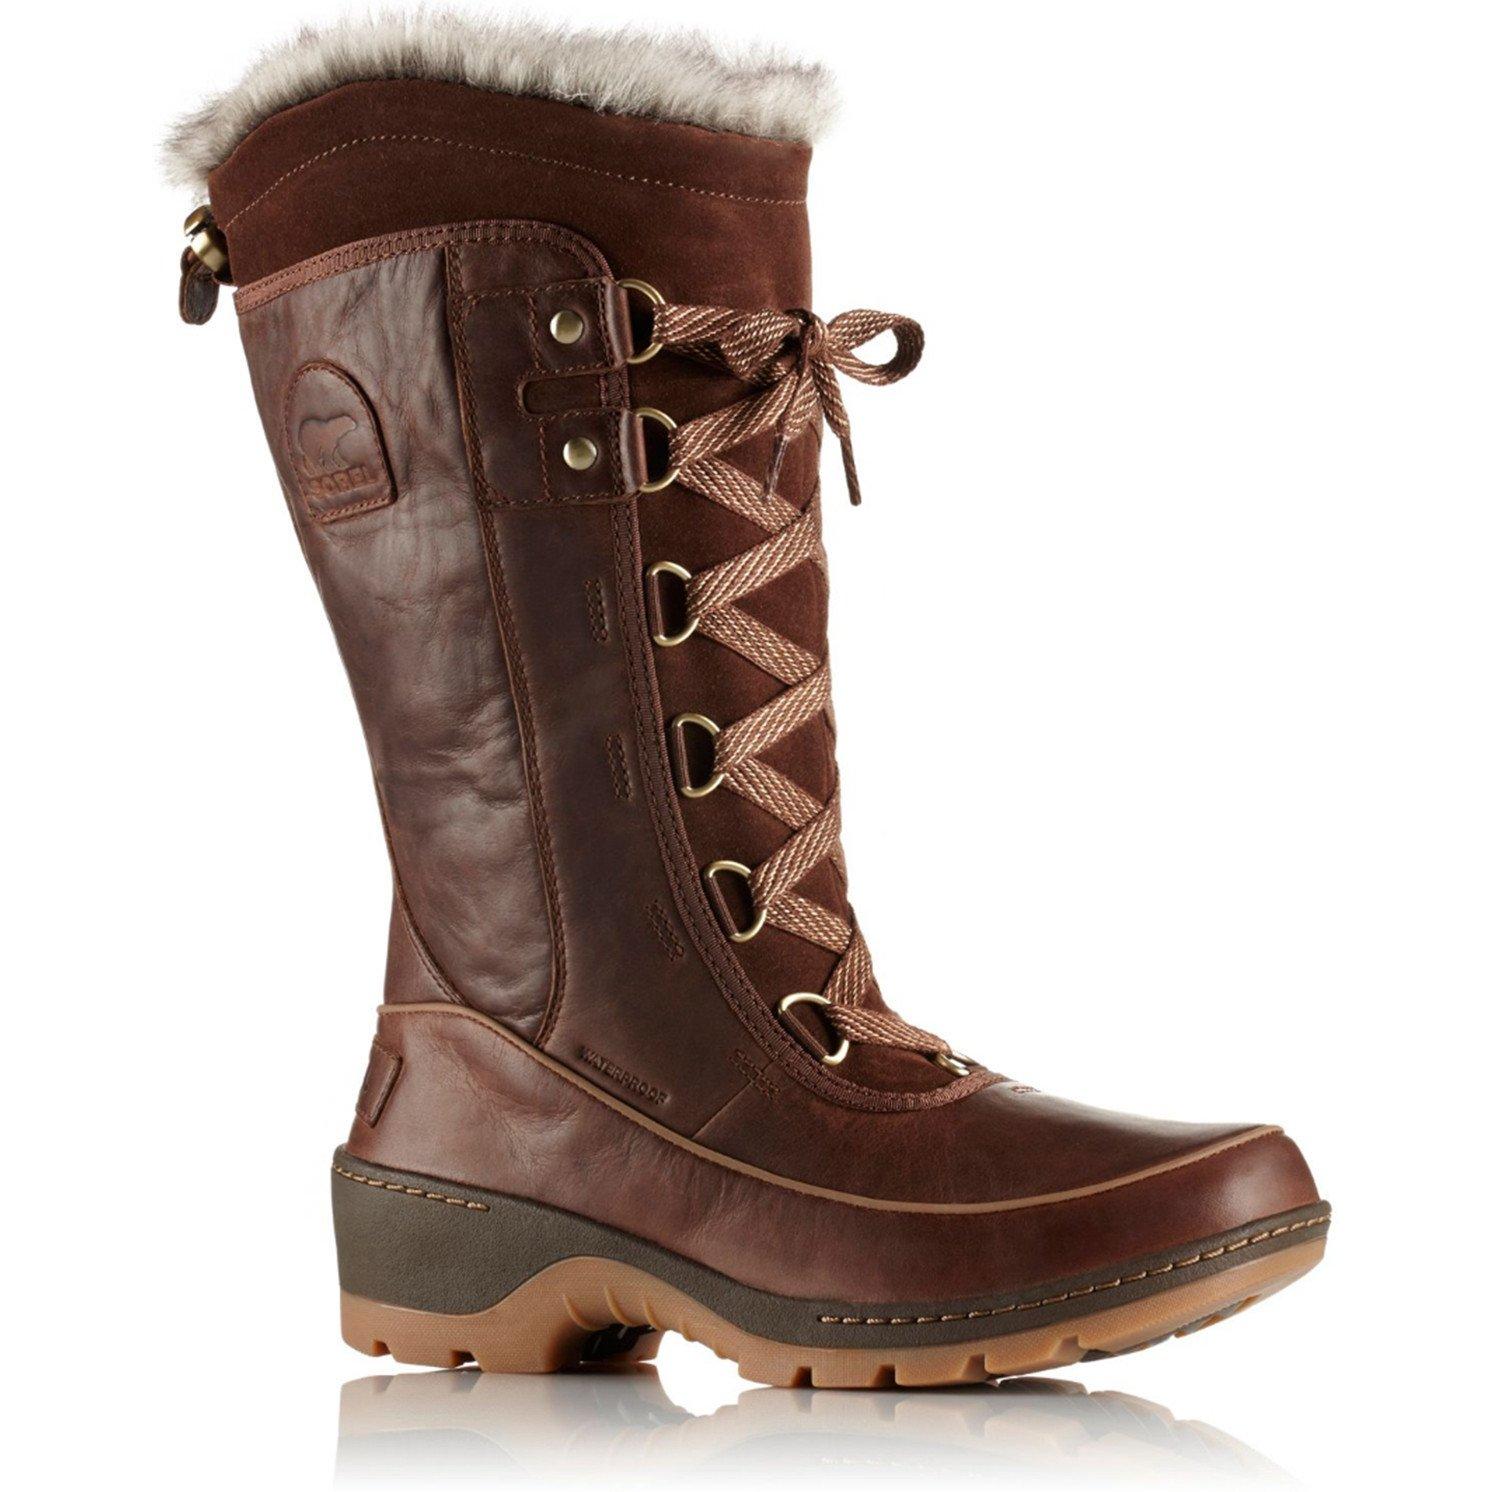 Sorel Torino High Premium Leather Womens Boots UK 6 Tobacco Delta